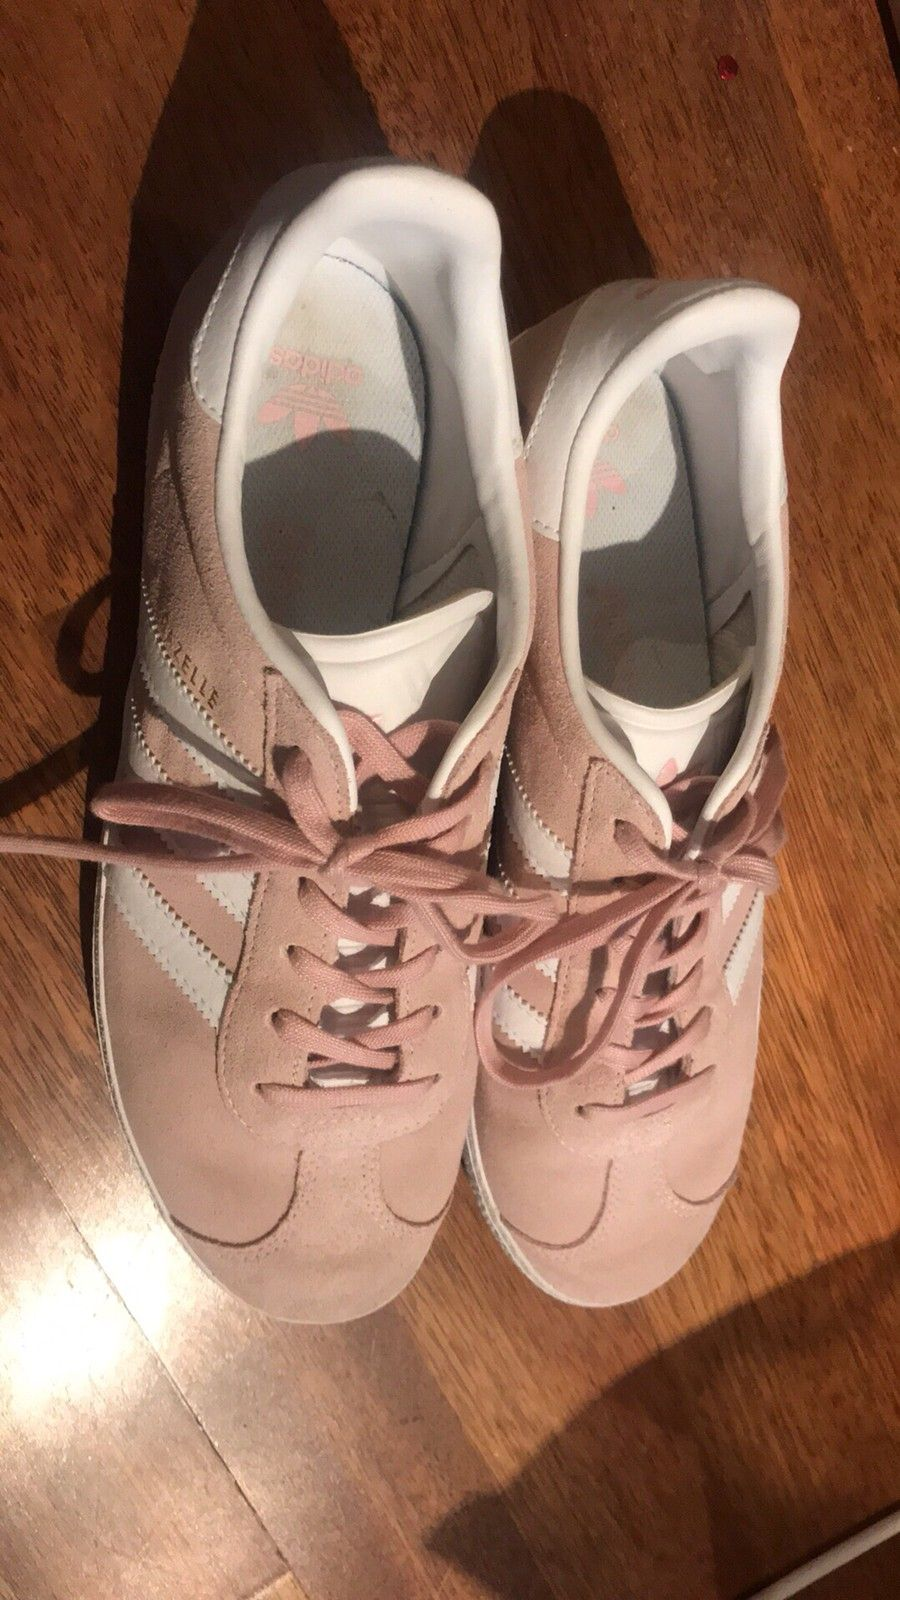 Rosa adidas sneakers   FINN.no